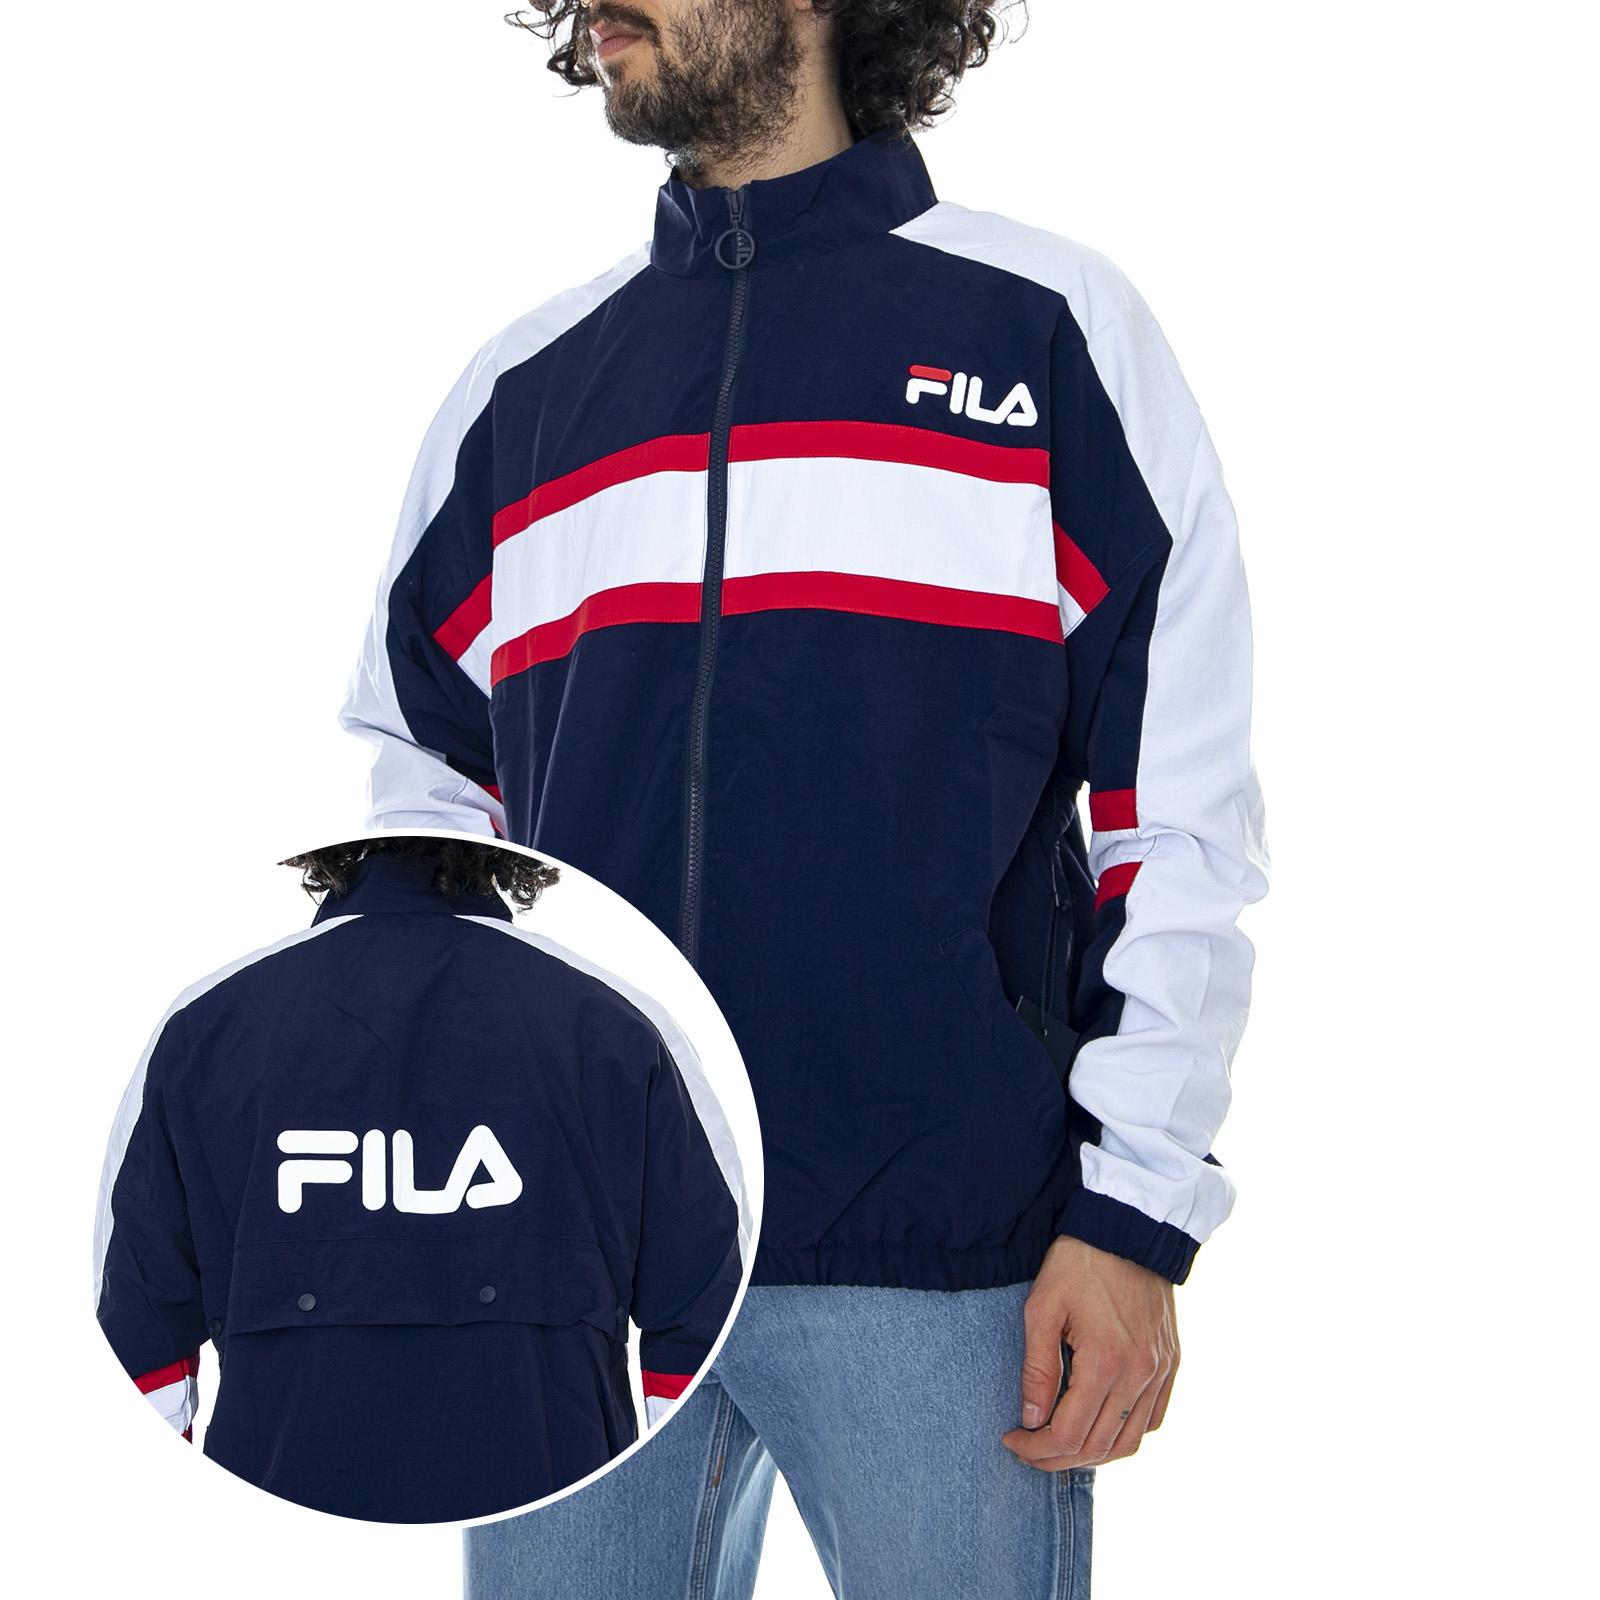 Details about Fila Men Carter Pop Peacoat Blue Jacket Light Man Blue